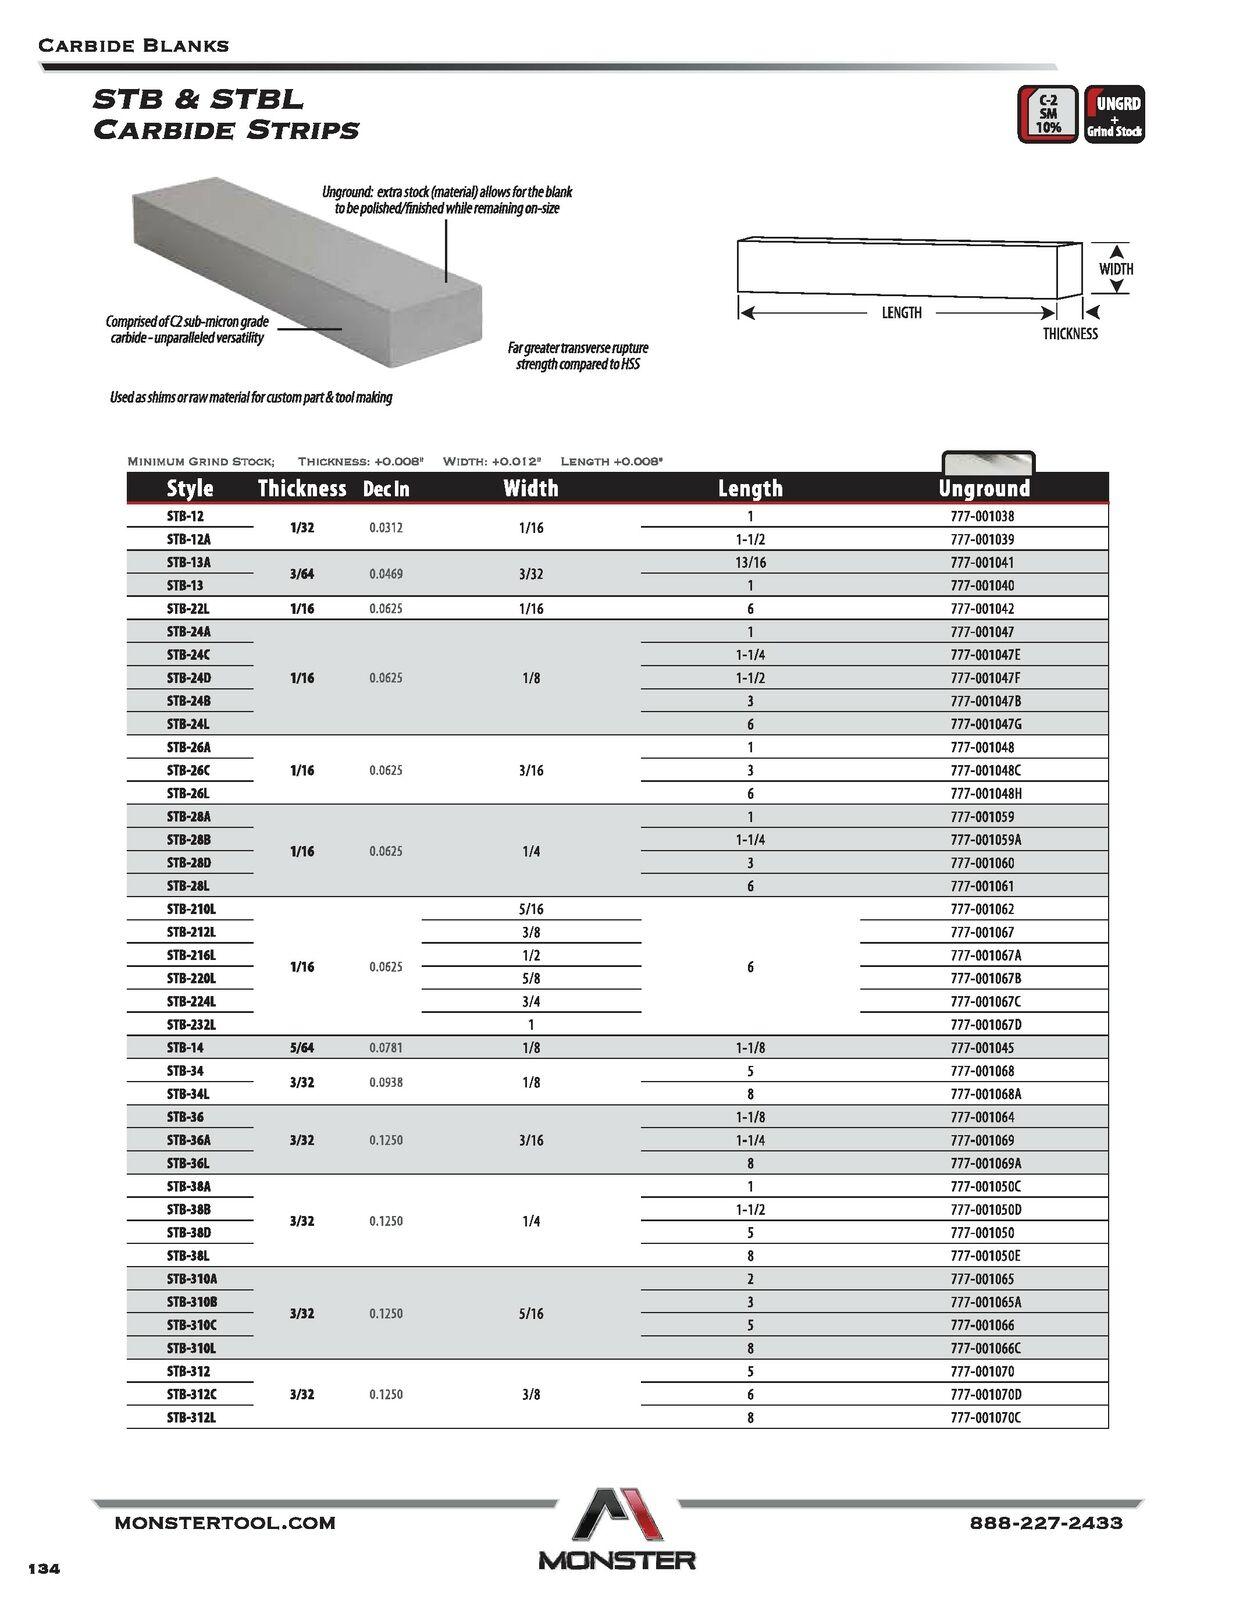 Made in USA Rectangular Strip Carbide Blank 1//16x3//16x6 STB26L Series